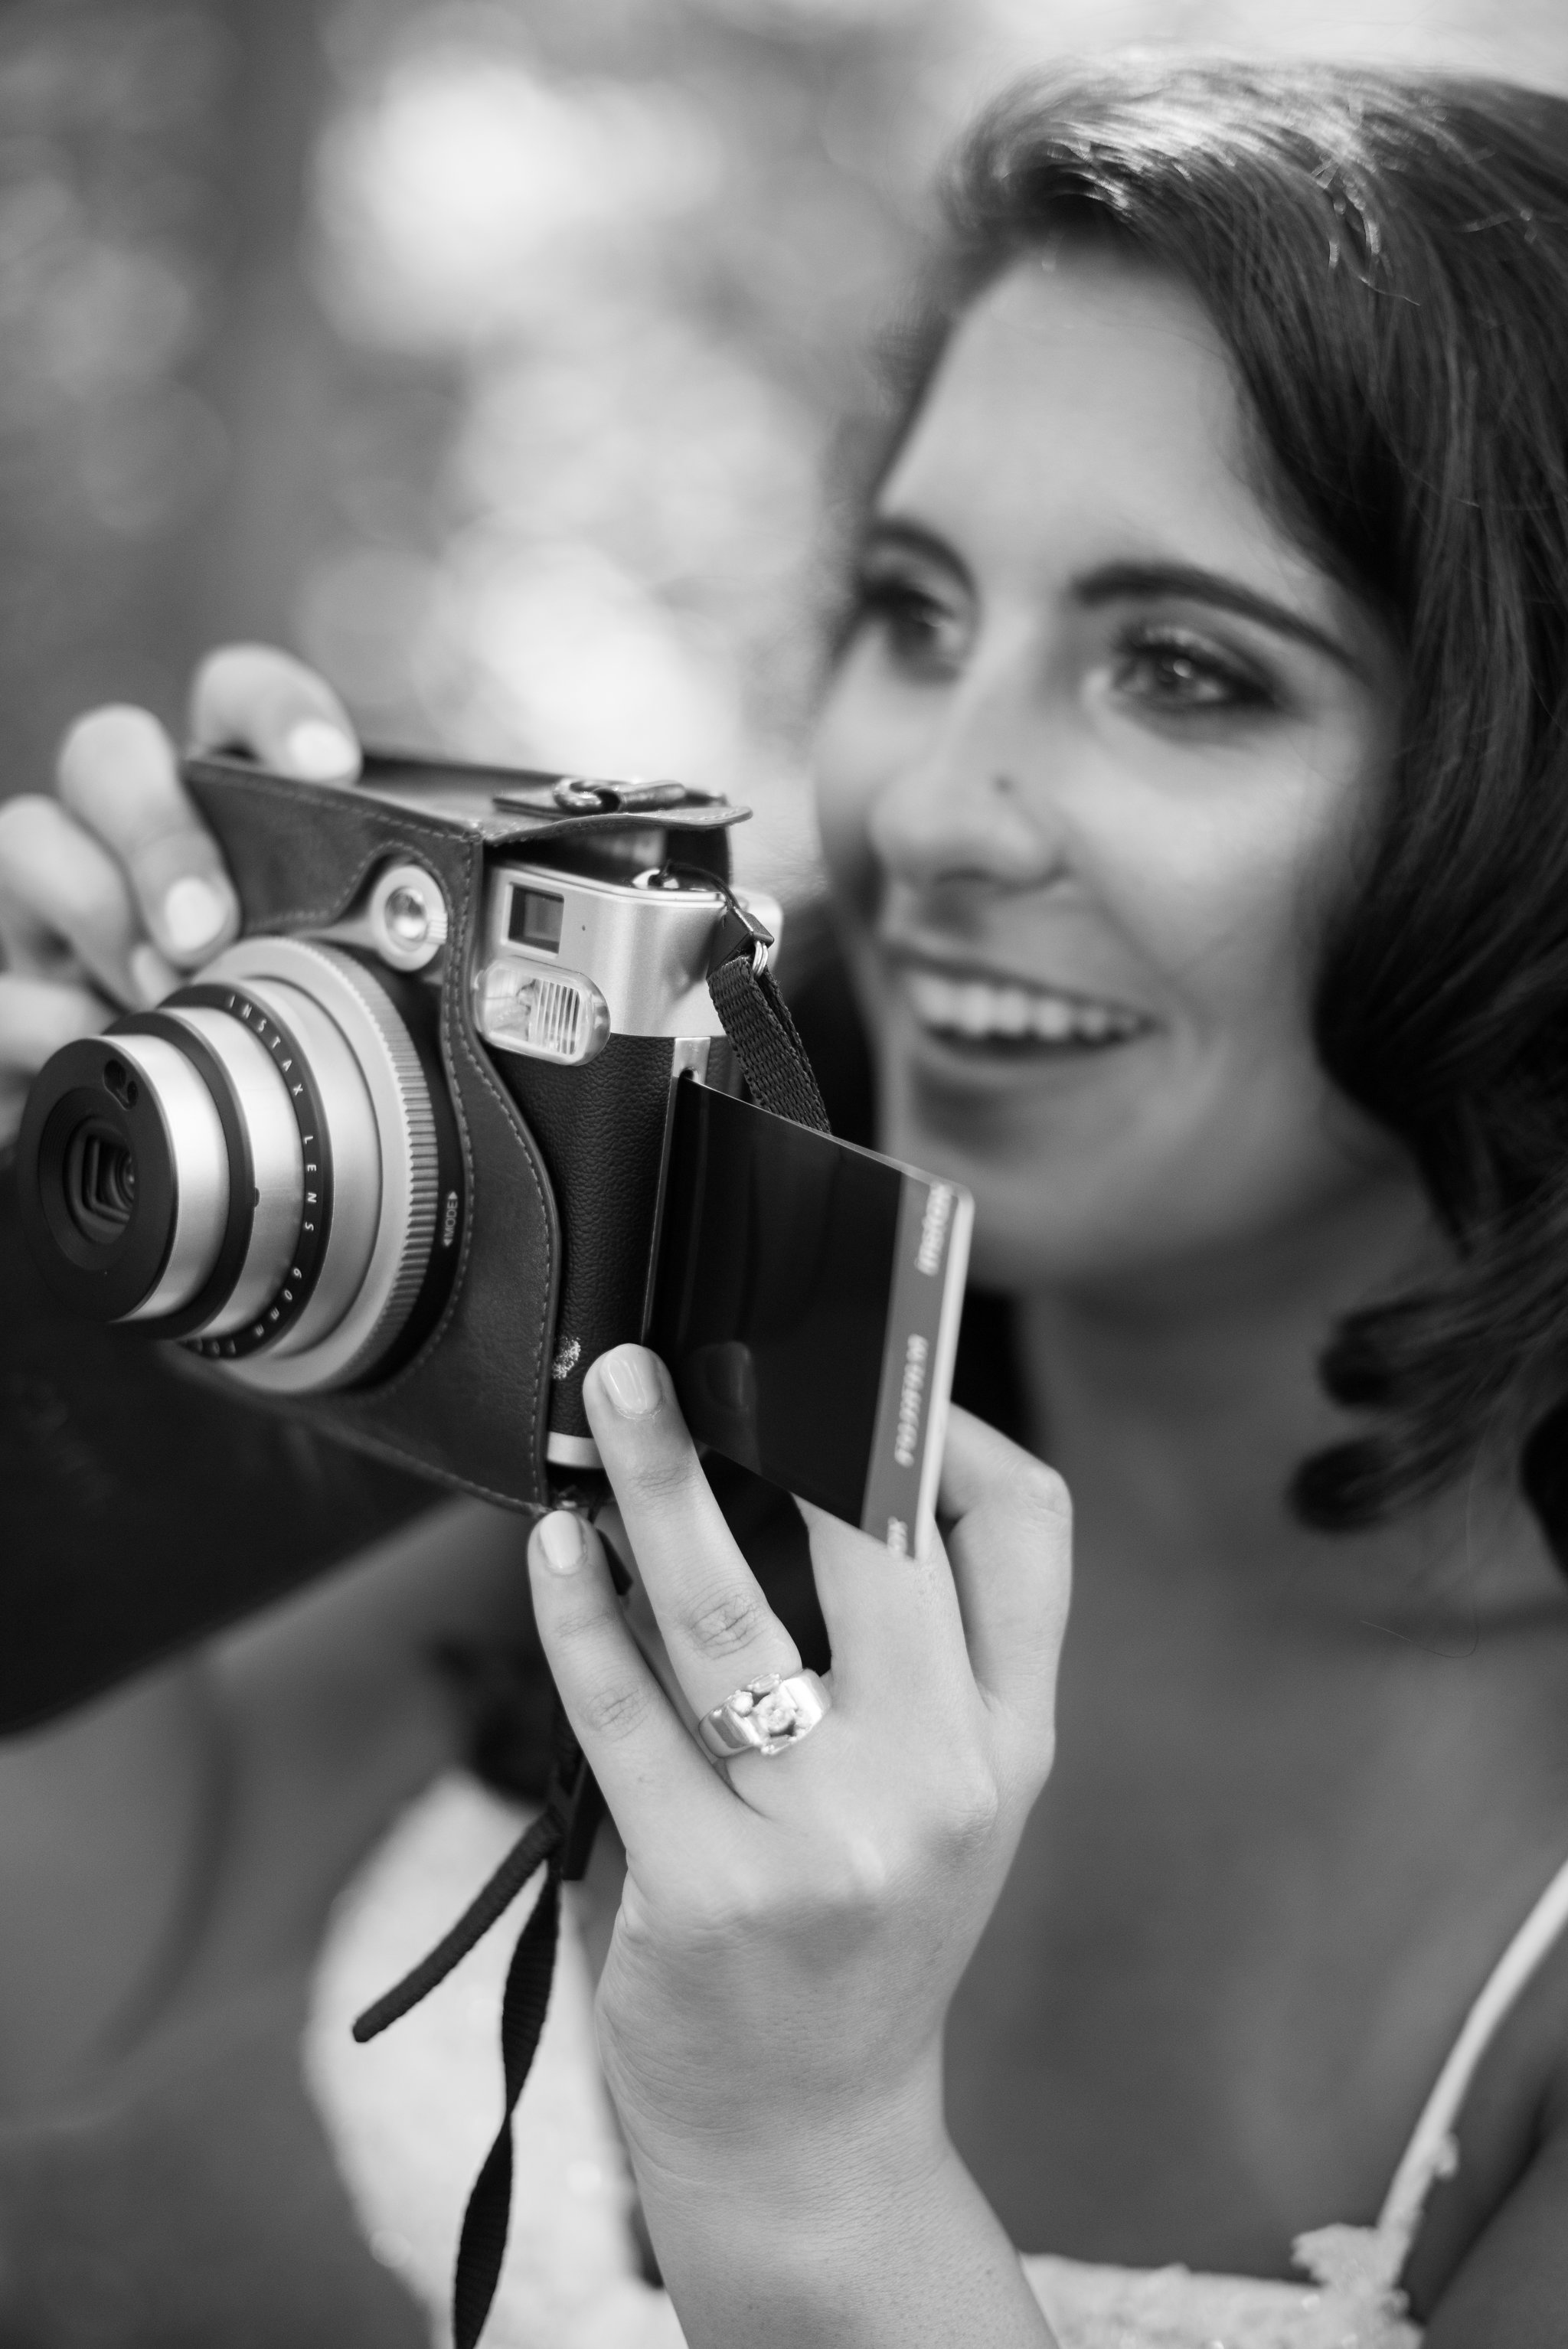 st-augustine-wedding-photographer-sarah-annay-photography.jpg22.jpg